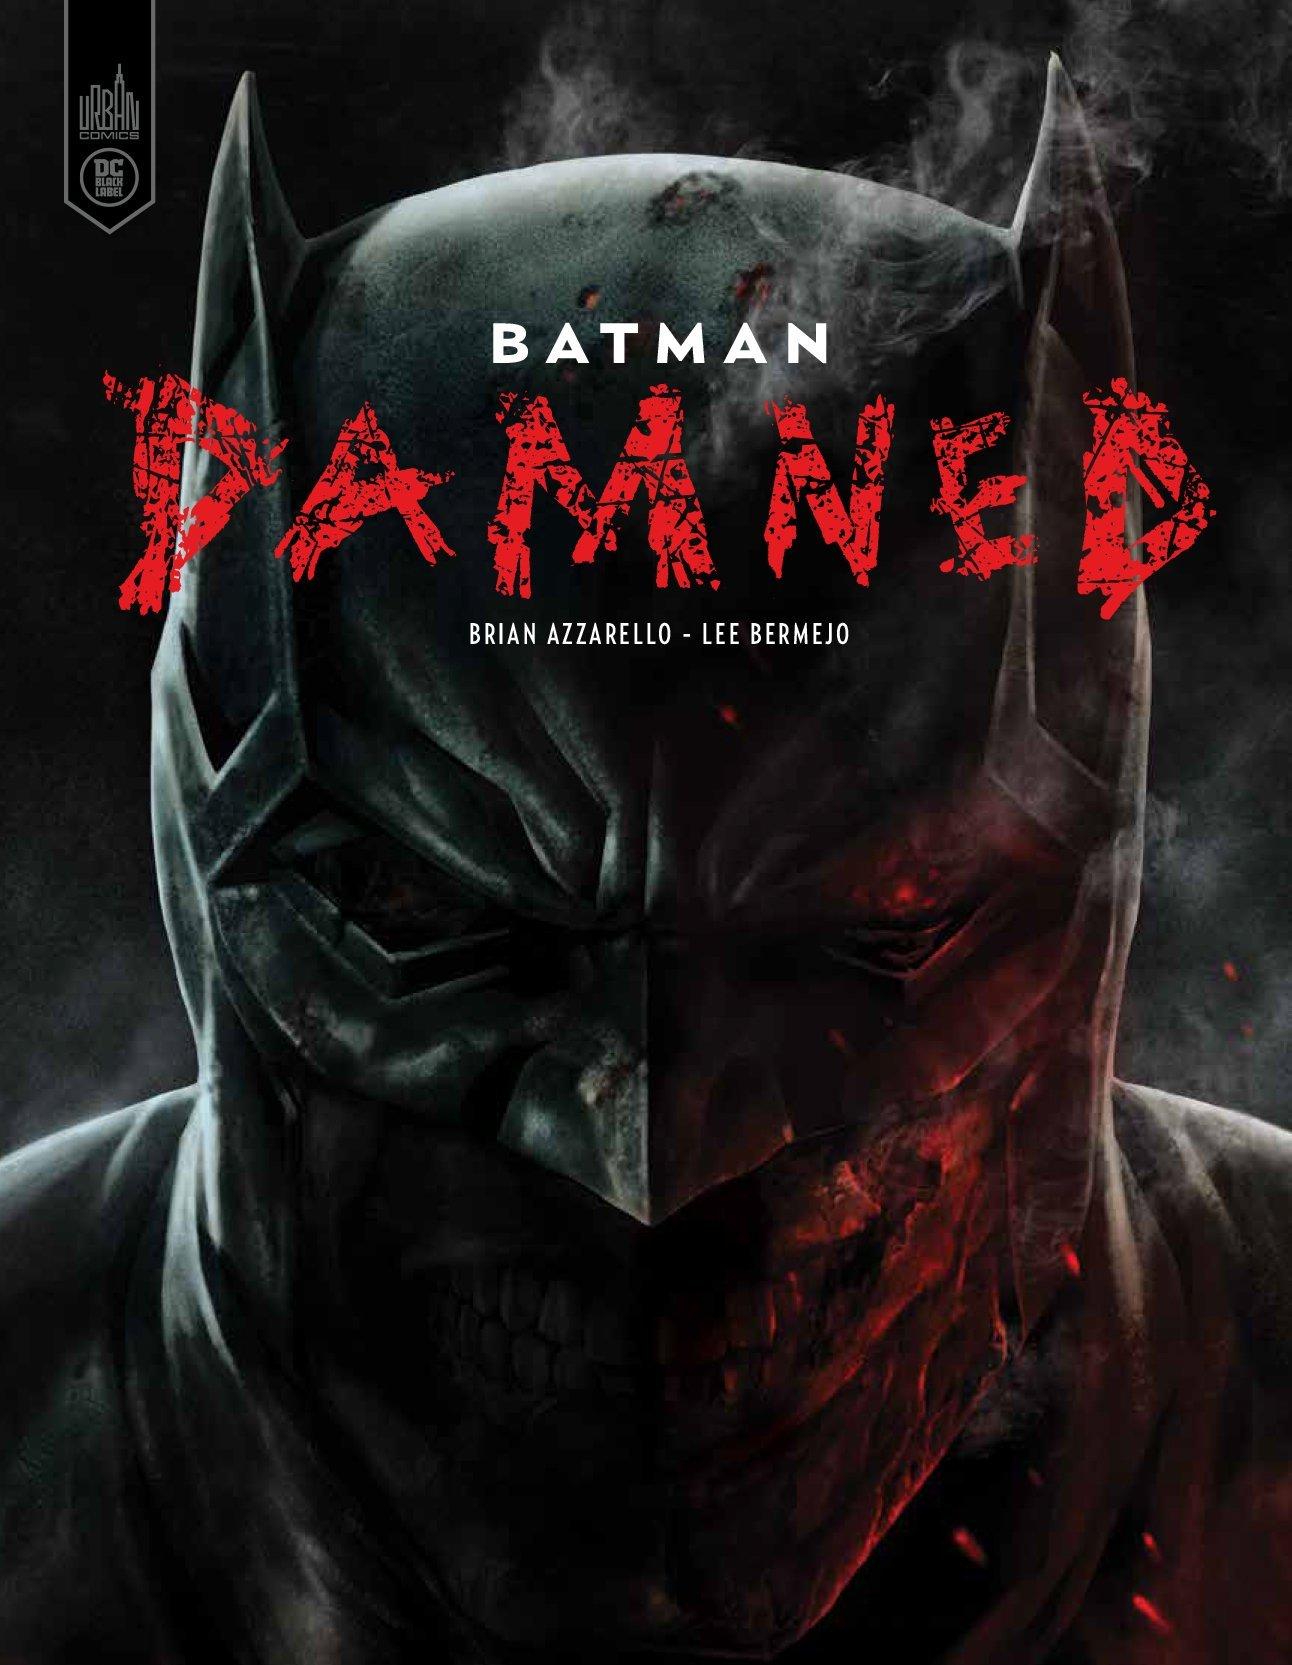 BATMAN-DAMNED - BATMAN - DAMNED